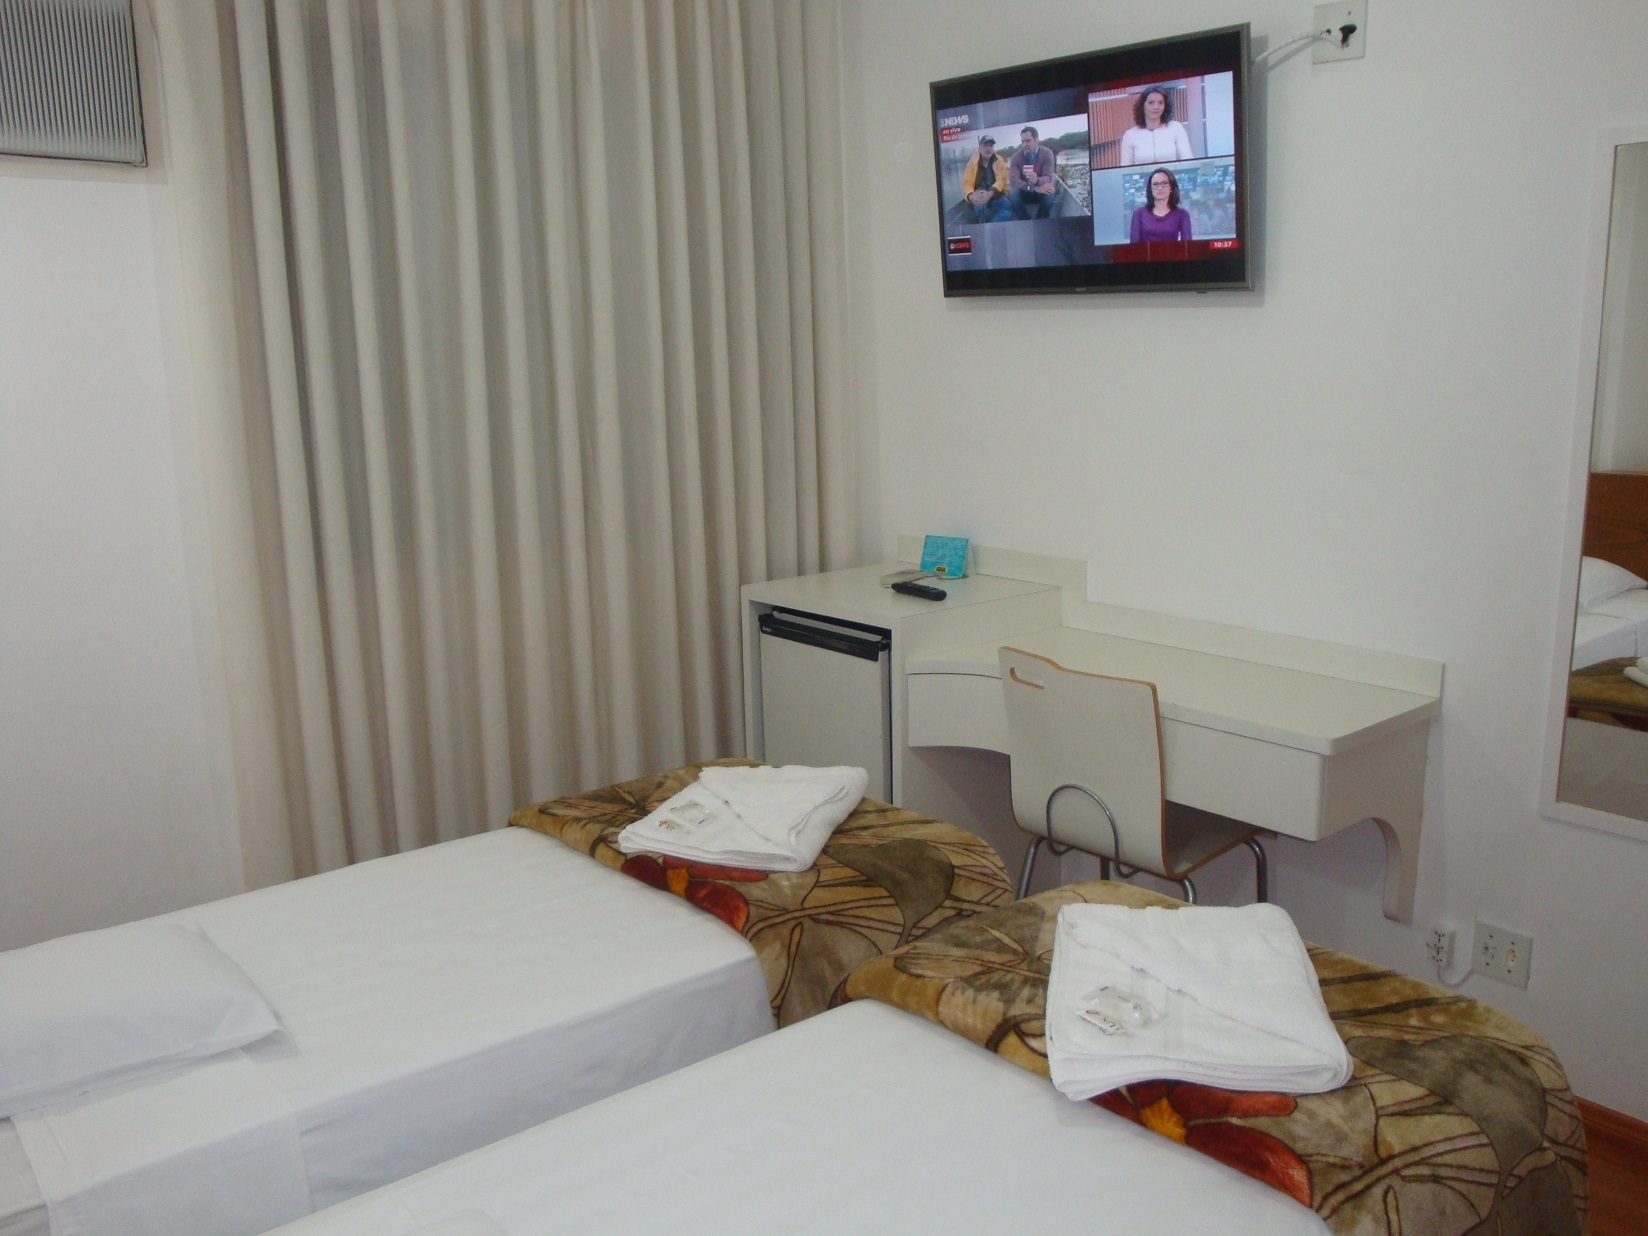 Hotel em São Paulo - Suíte Duplo - Hotel San Gabriel